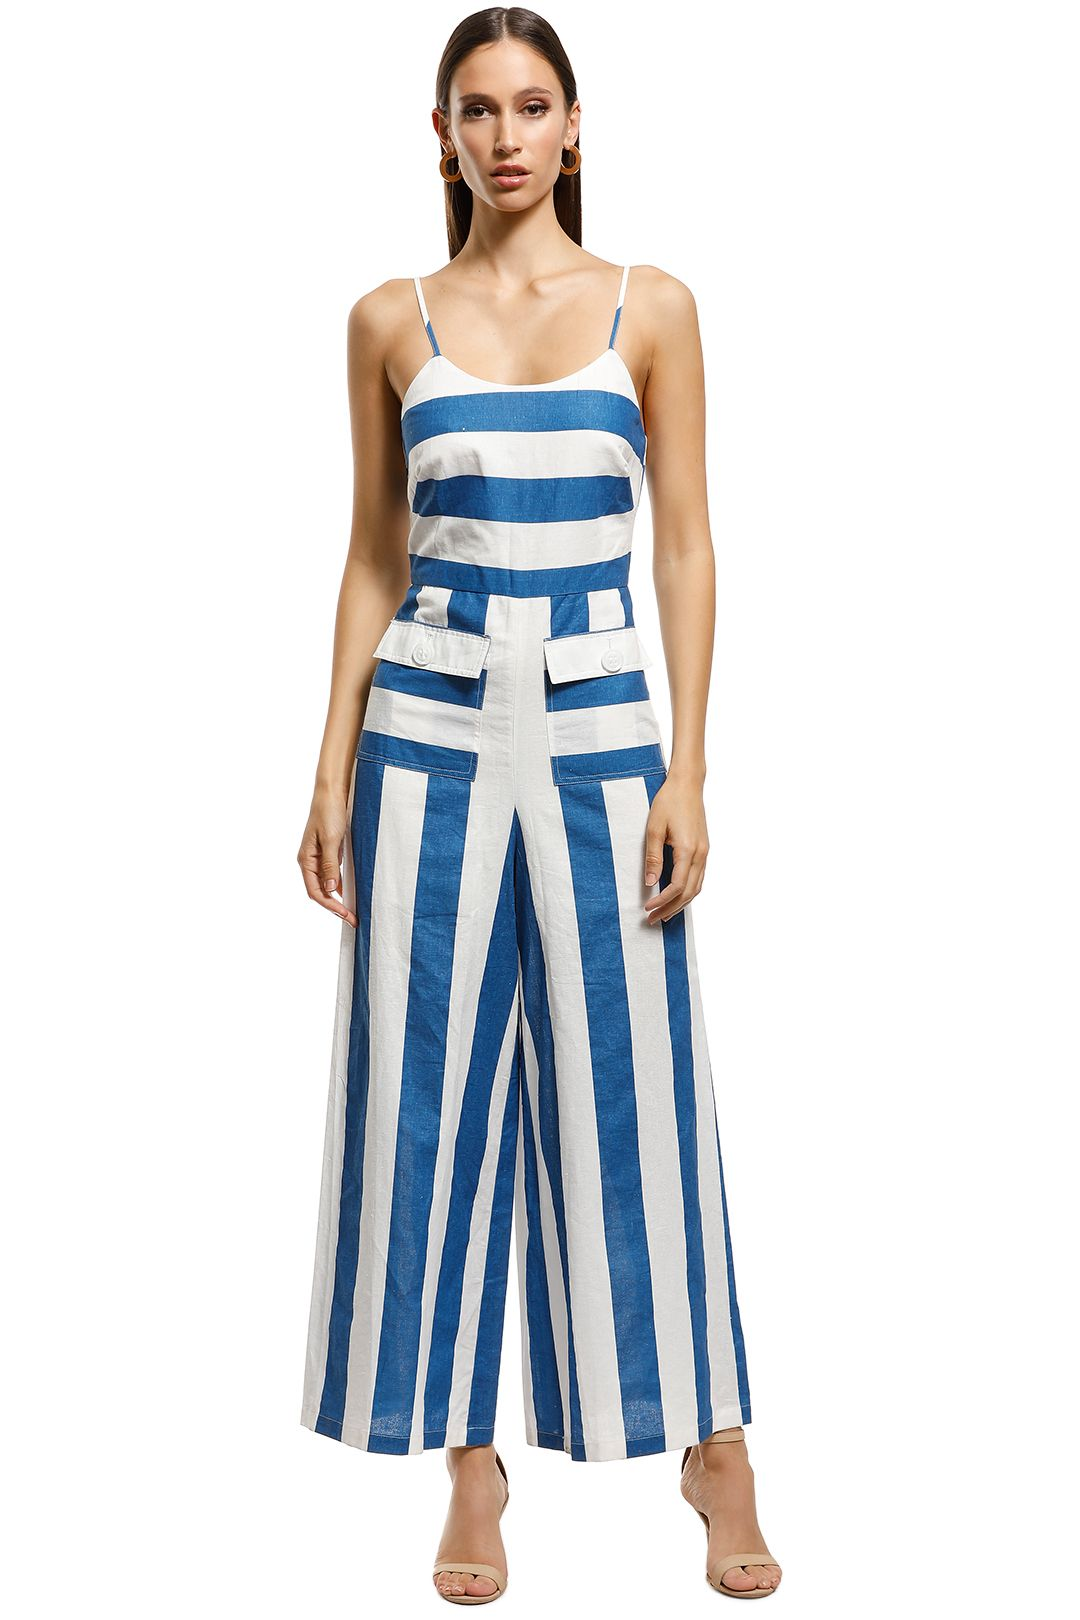 Talulah - Sea Bound Midi Dress - Blue - Front